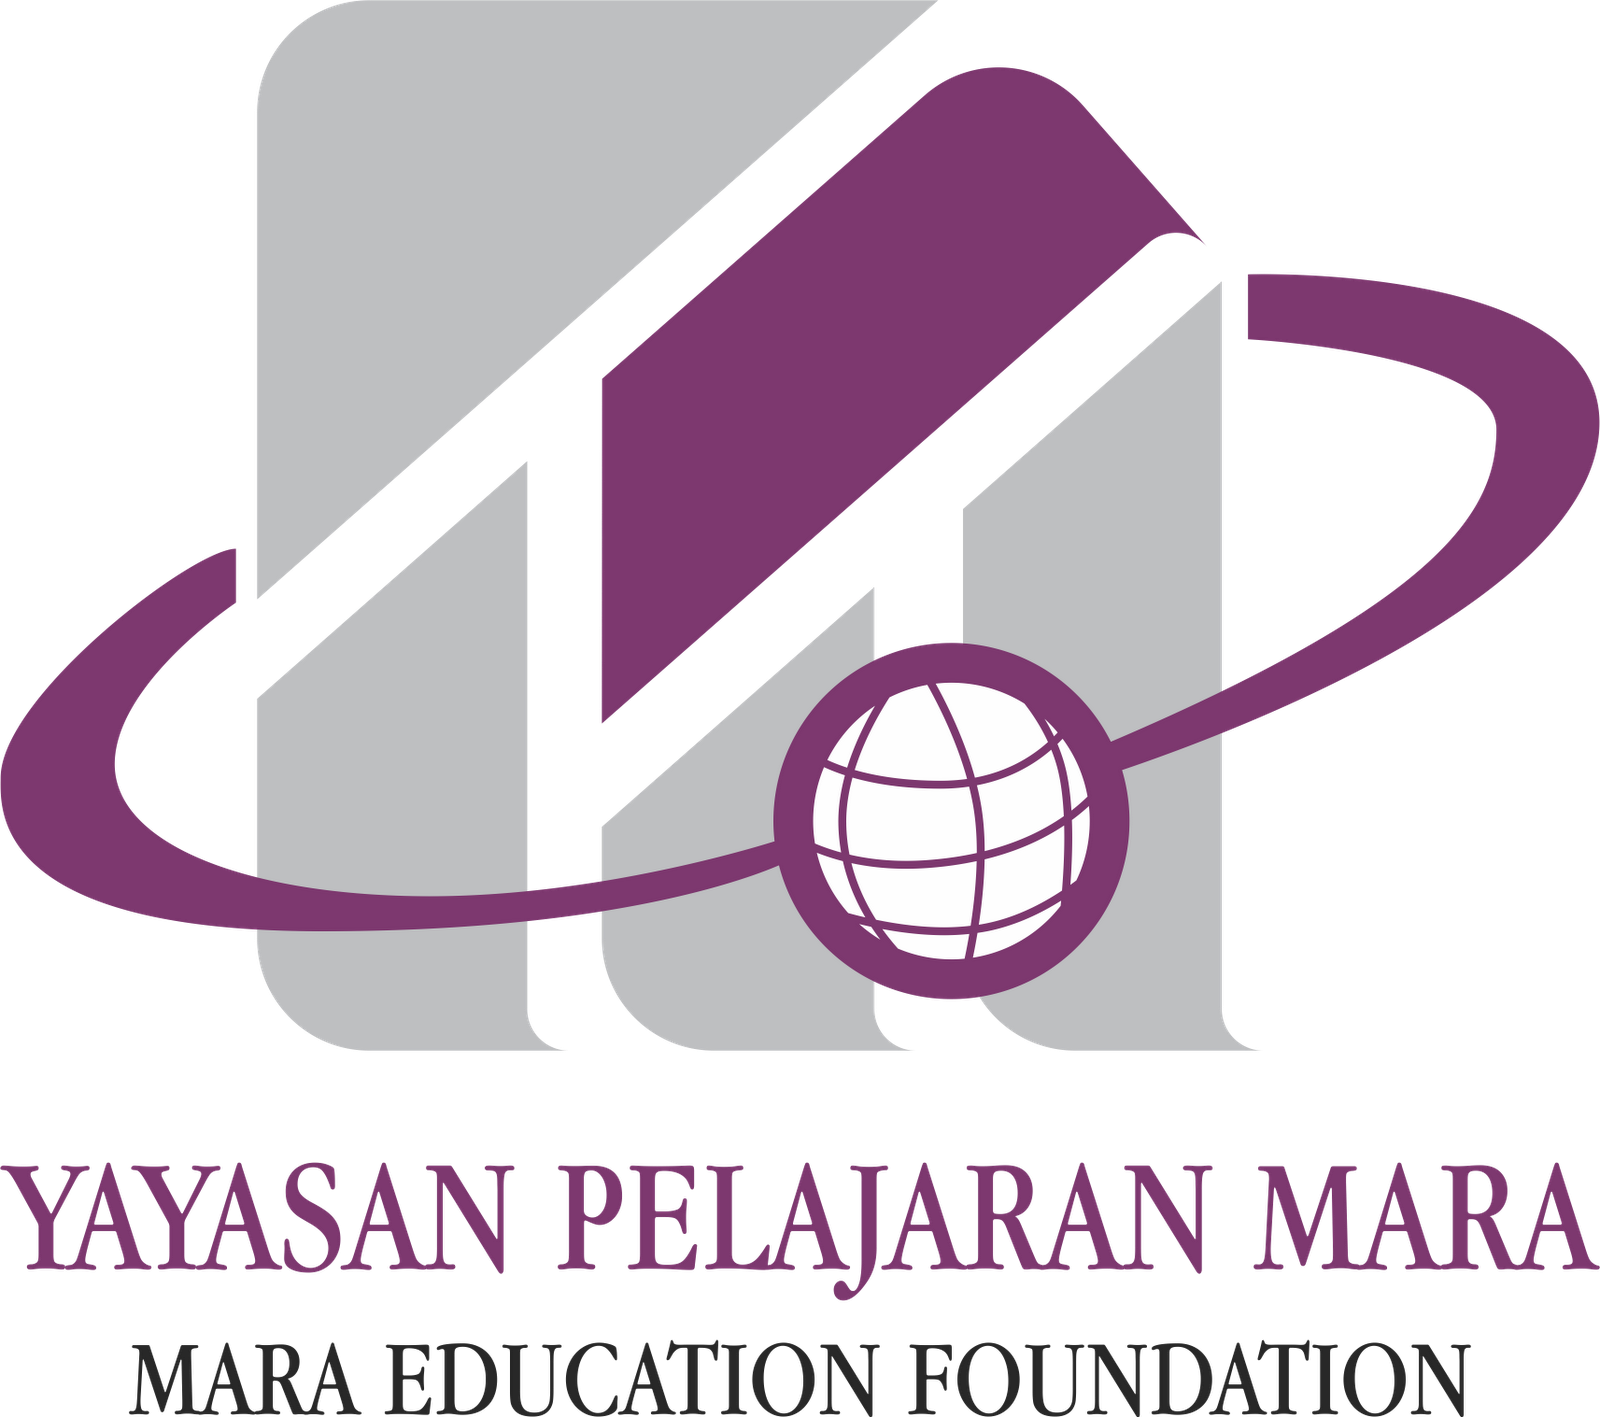 Yayasan Pelajaran MARA JAD-MJHEP Scholarship